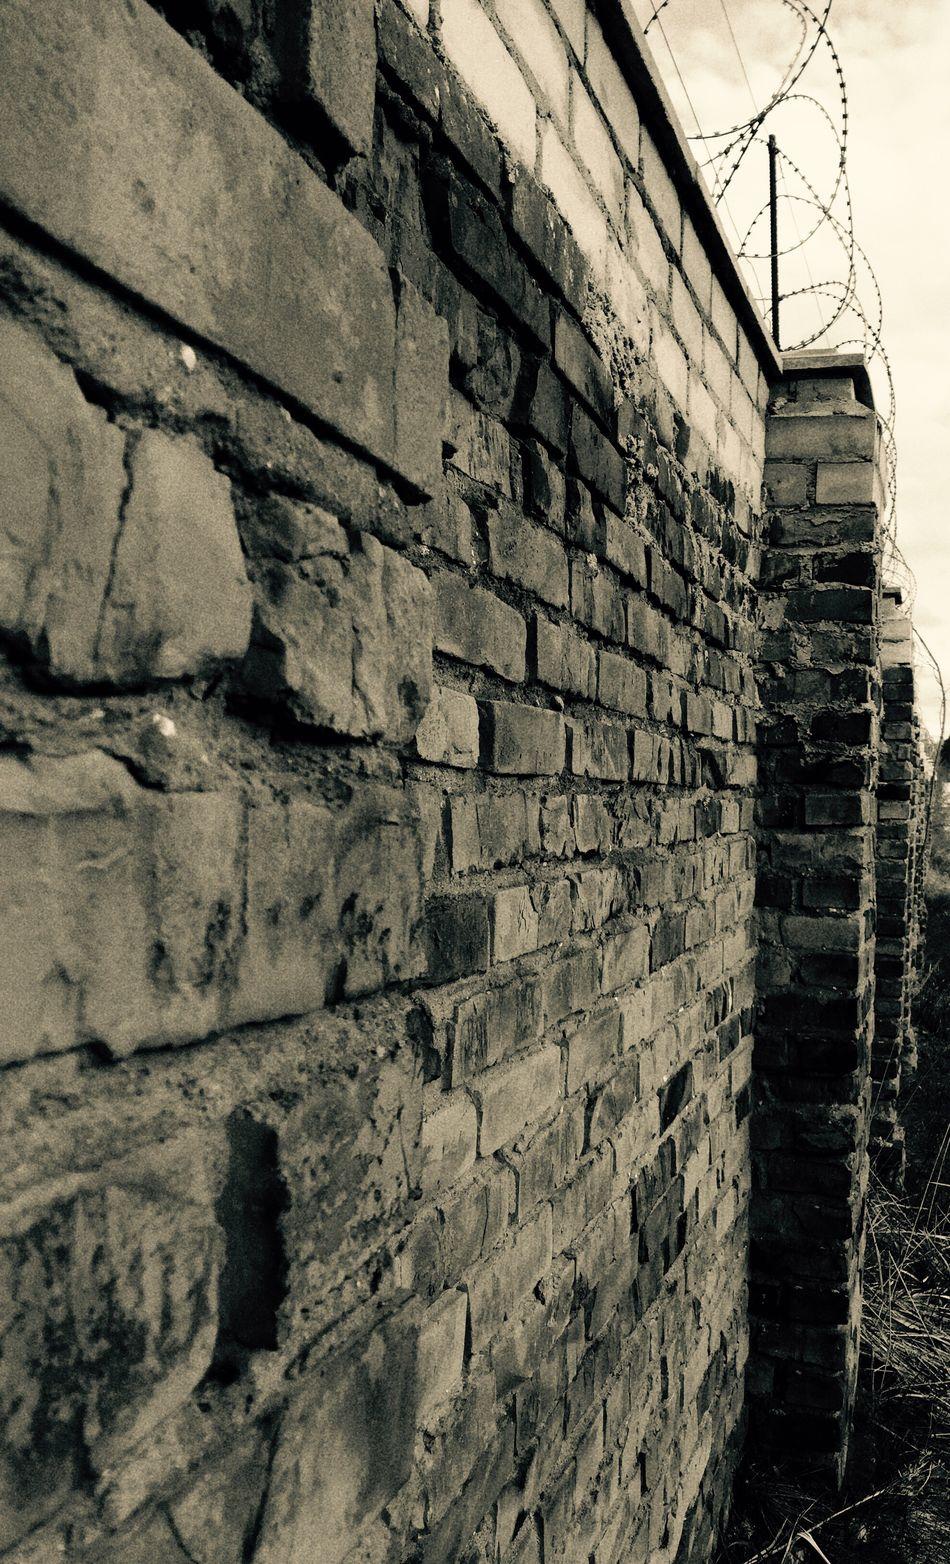 Wall Bricks Black White Dark Prison Urban No People Brick Wall EyeEmNewHere